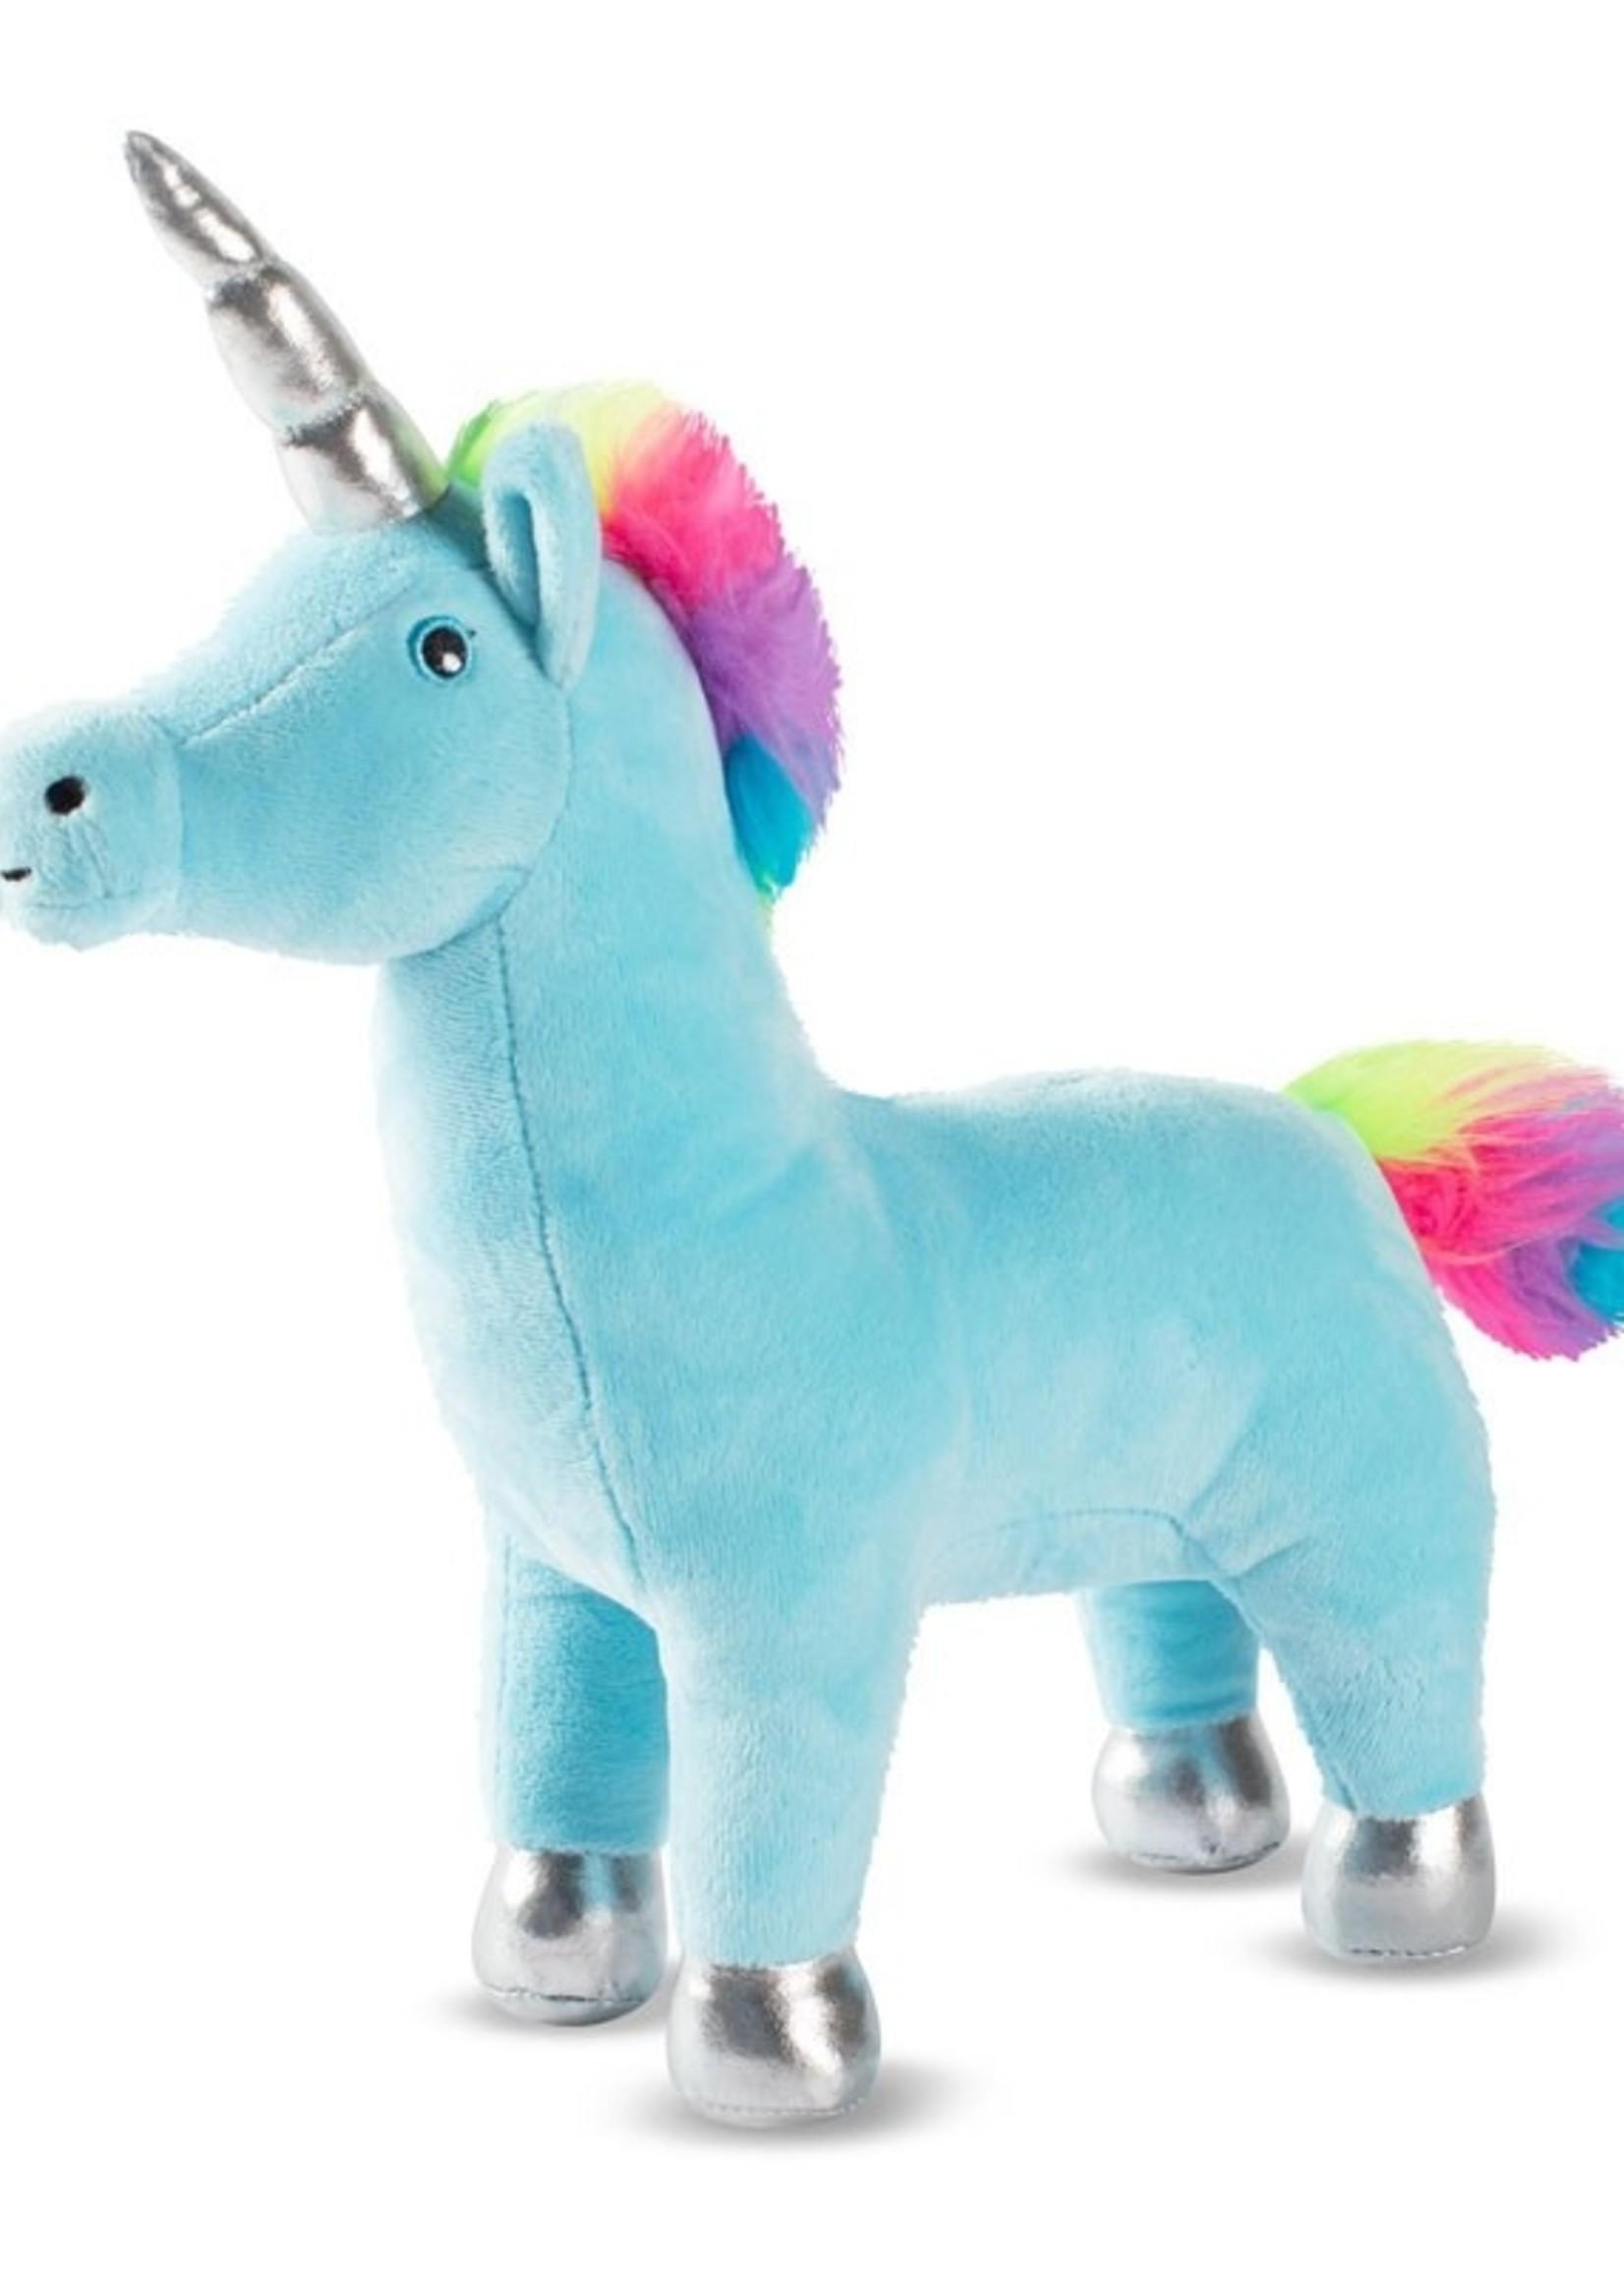 Fringe Studio Over the rainbow unicorn